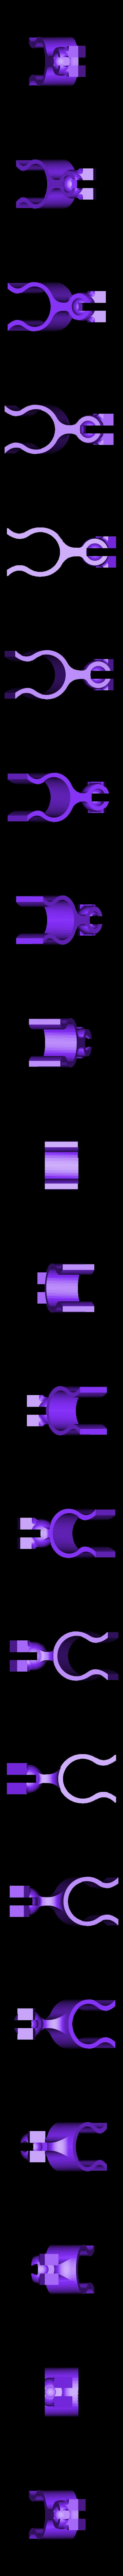 Porte_Lampe_Rotule.STL Download free STL file Lamp holder for Cage modular DSLR • 3D printing template, vanson